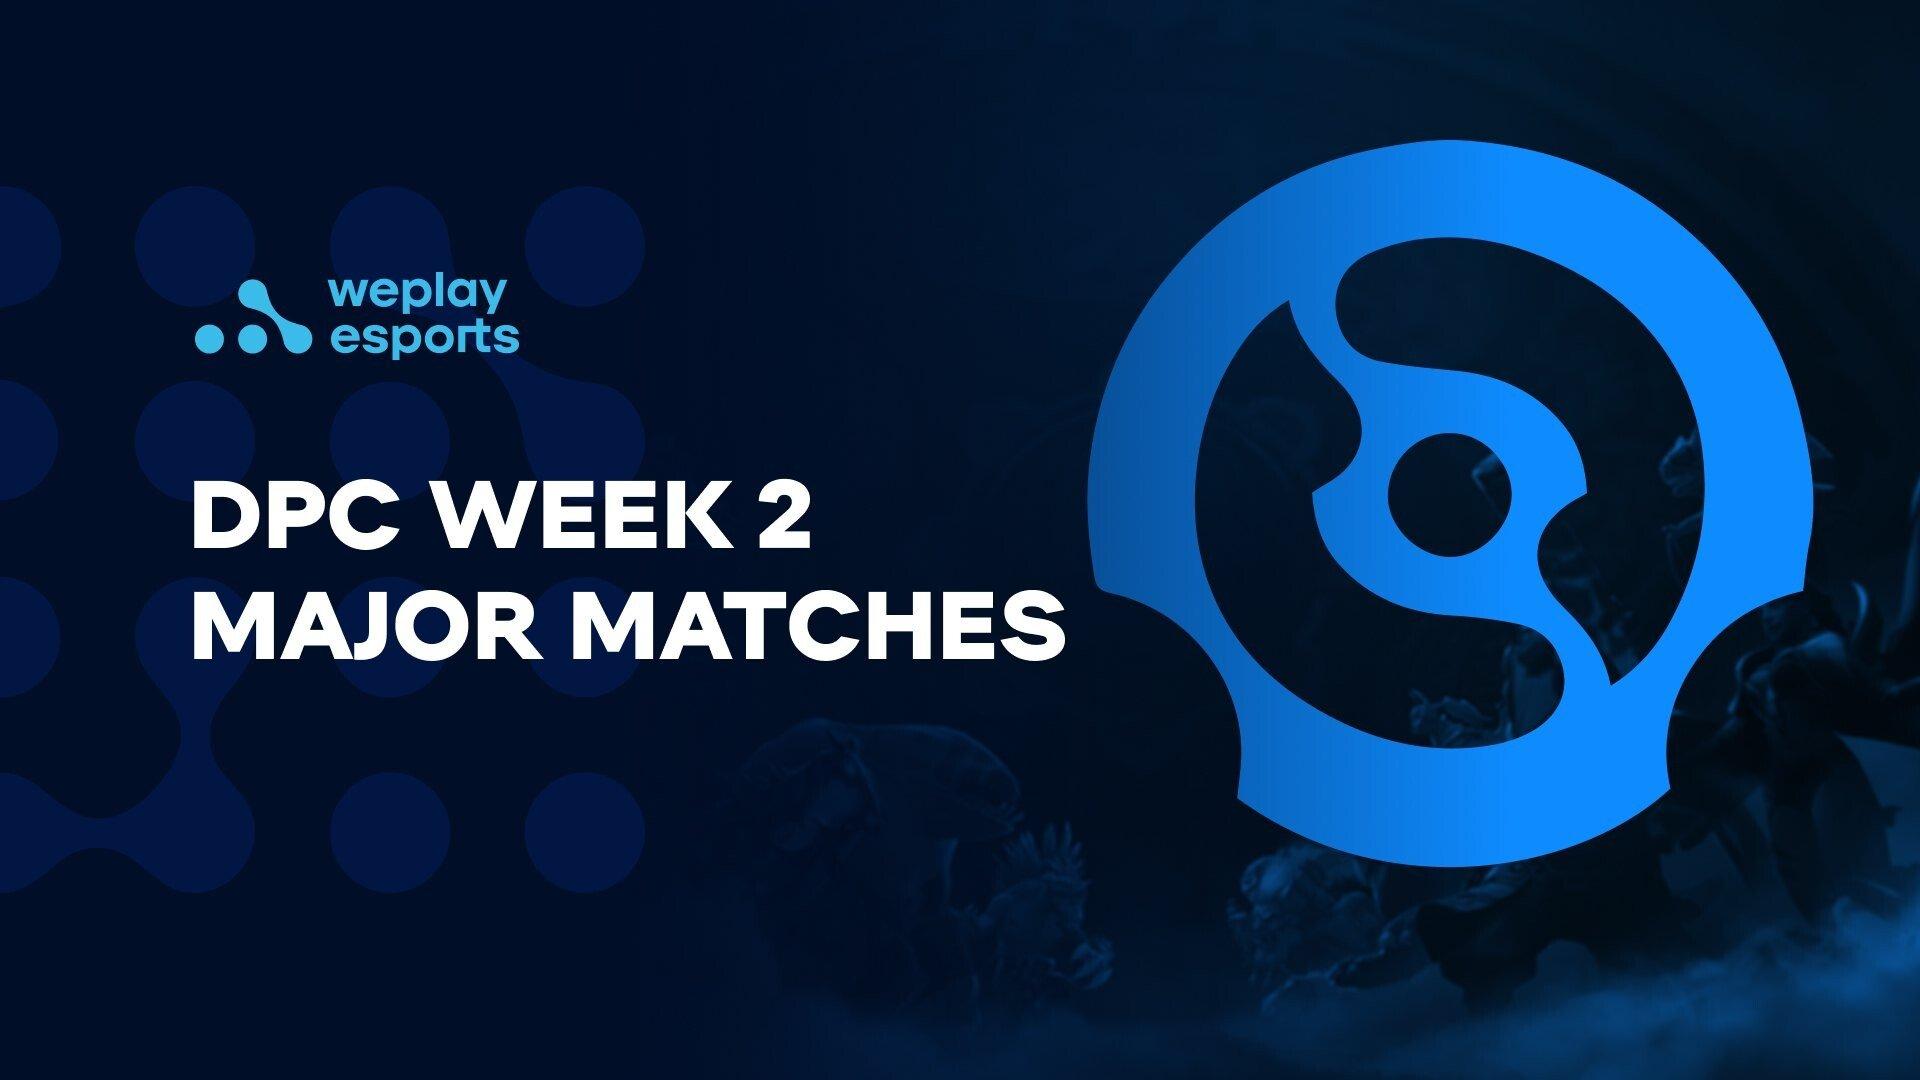 Five DPC Week 2 Major Matches